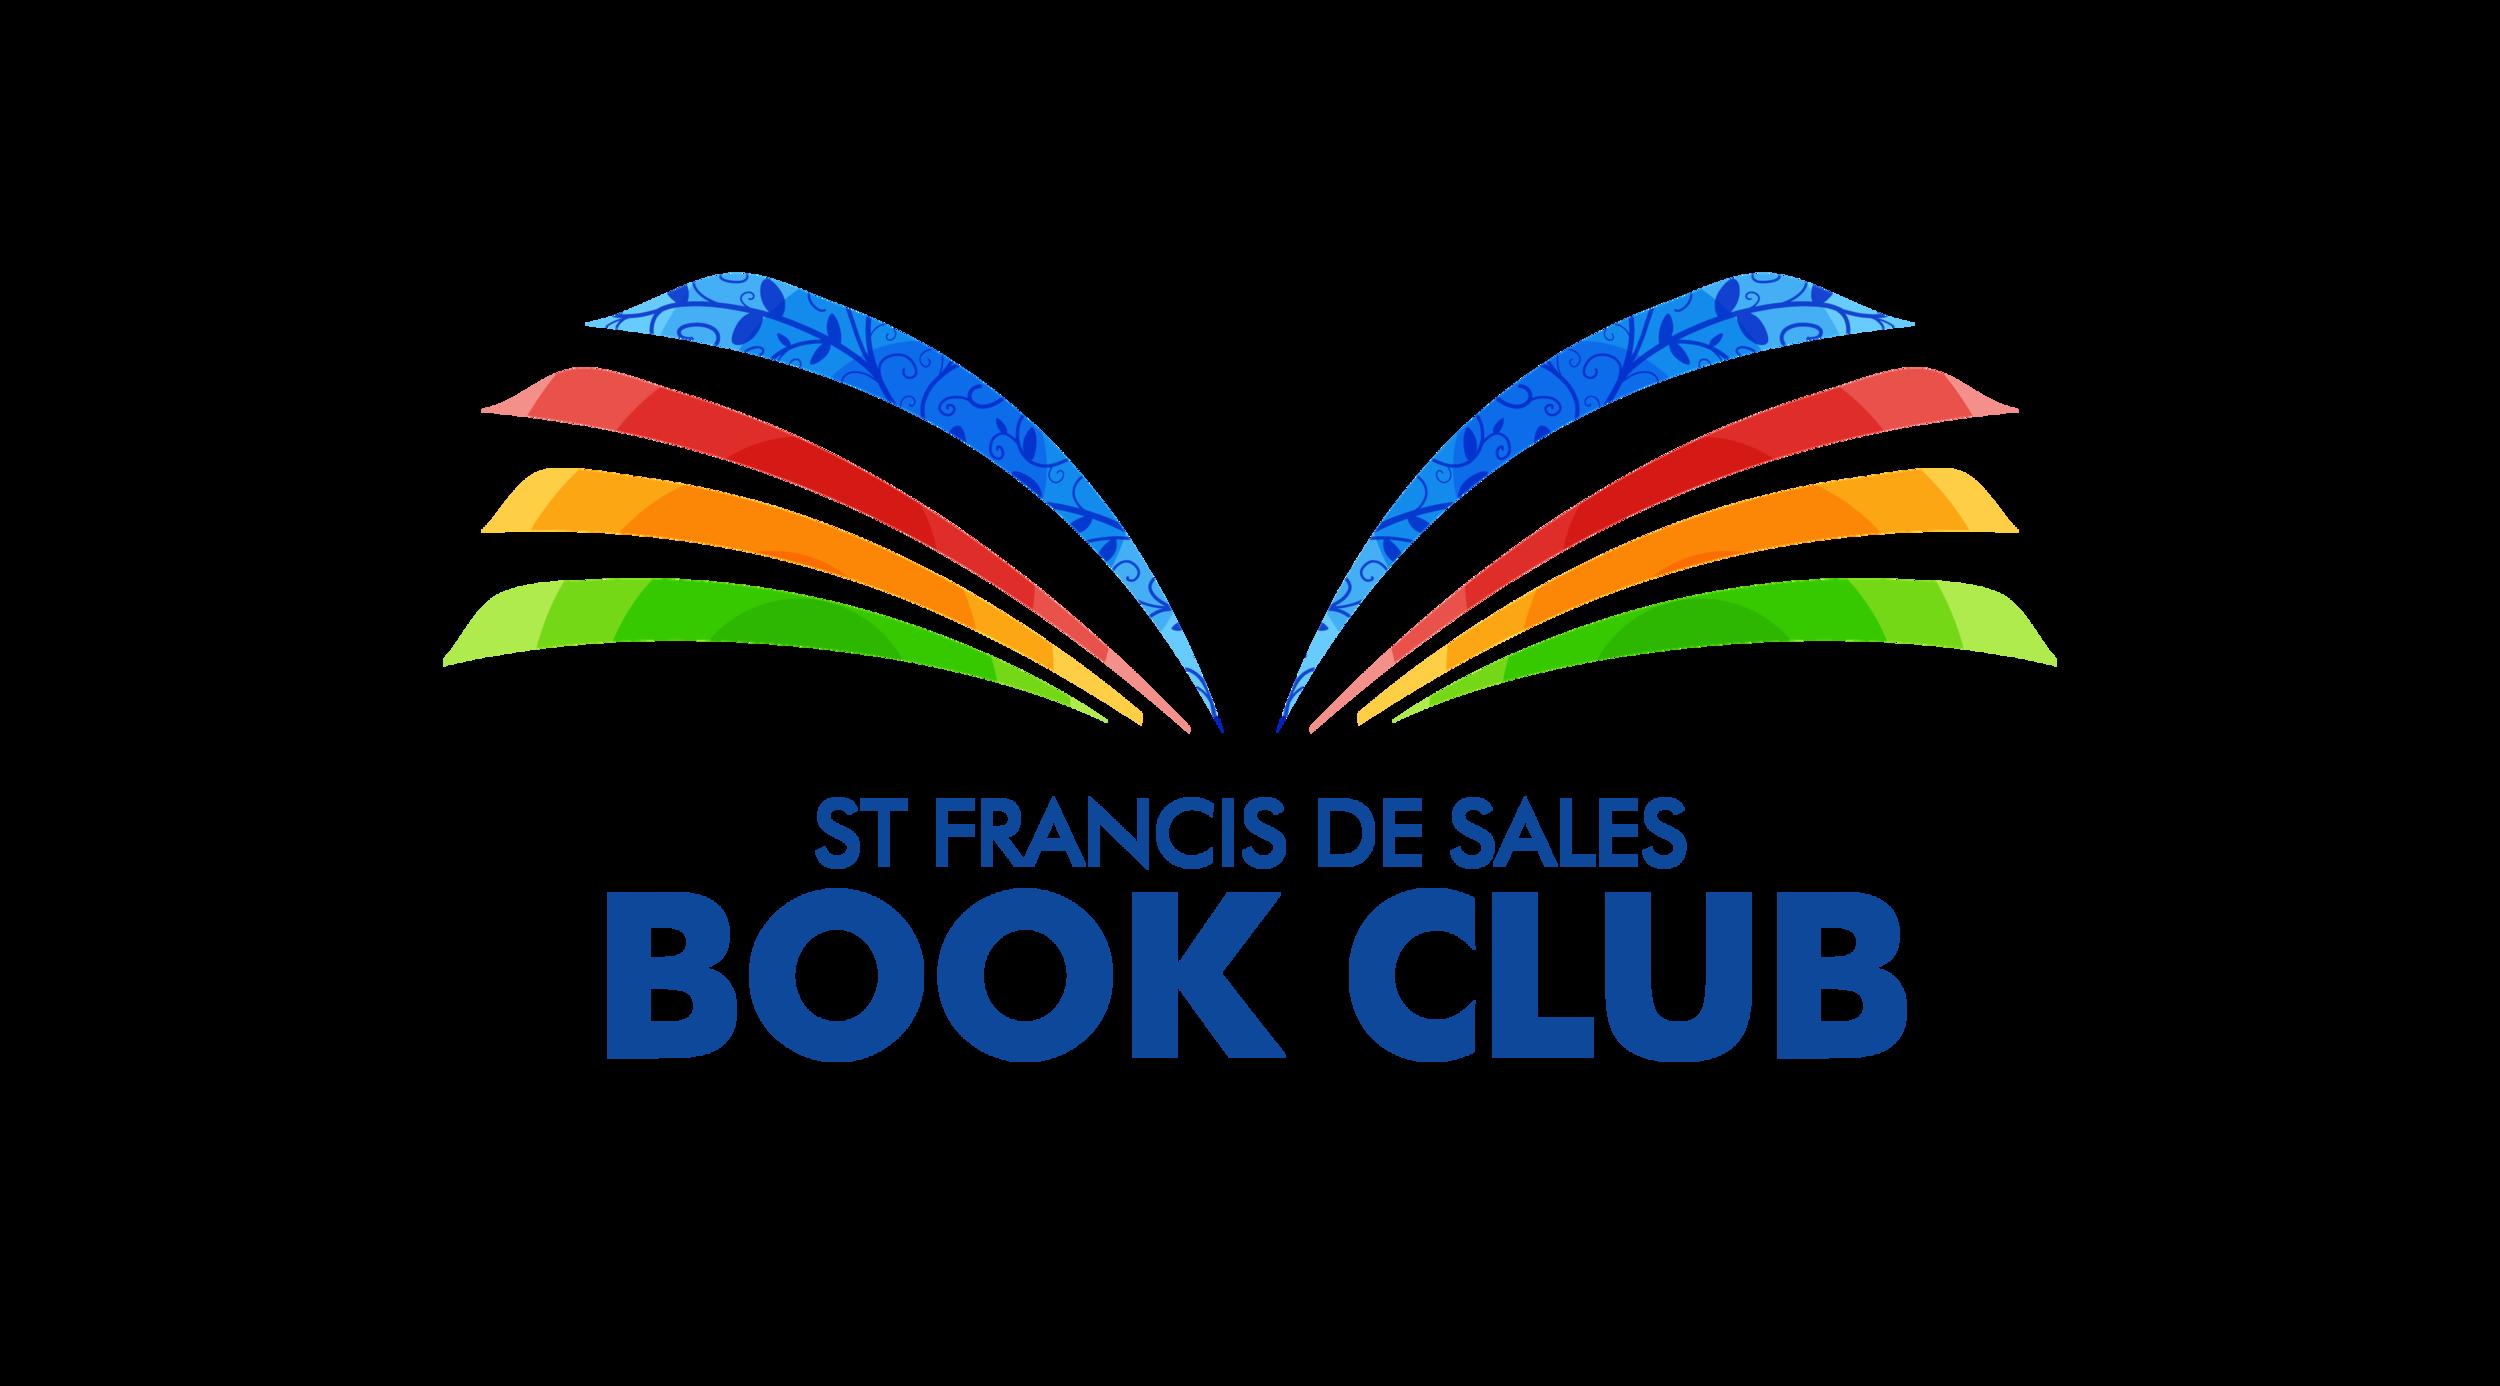 catholic-book-club-st-francis-de-sales-catholic-church-new-york.png